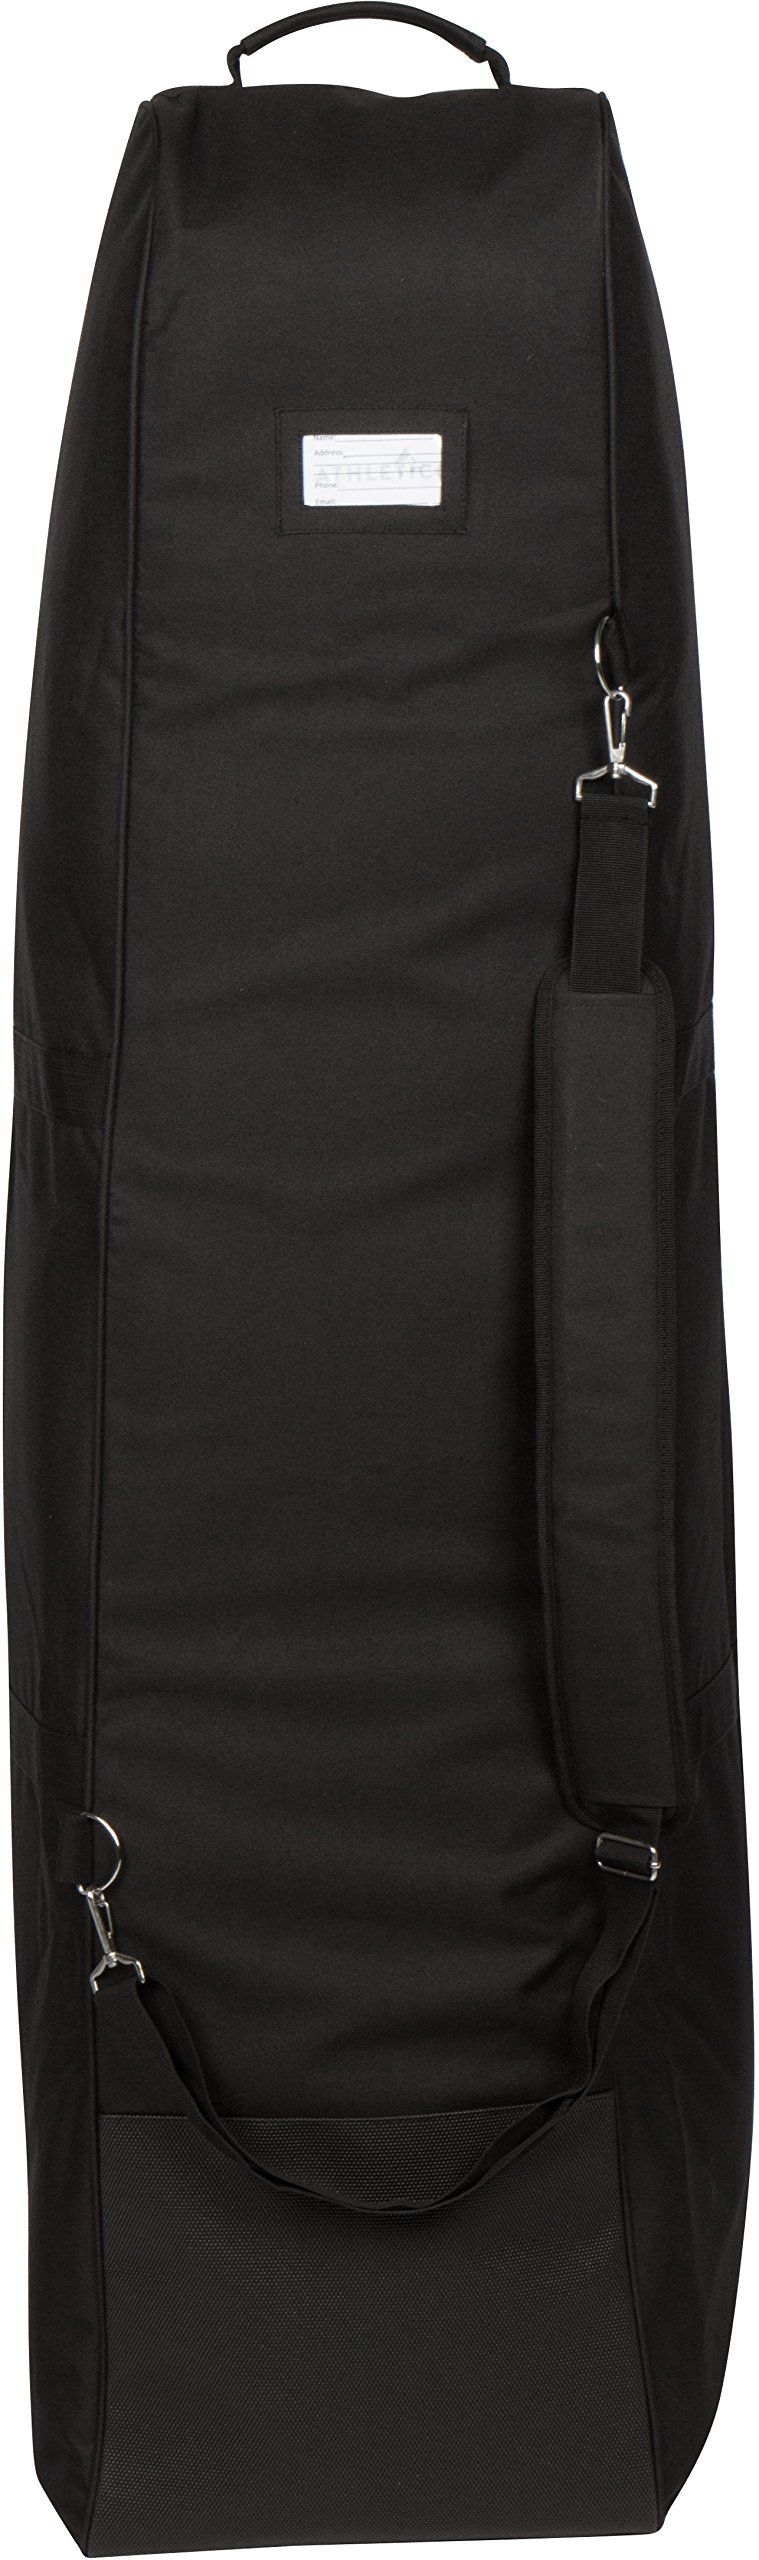 Golf Bag     Athletico Padded Golf Travel Bag Golf Club Travel Cover To  Carry 20d43d908e3d2